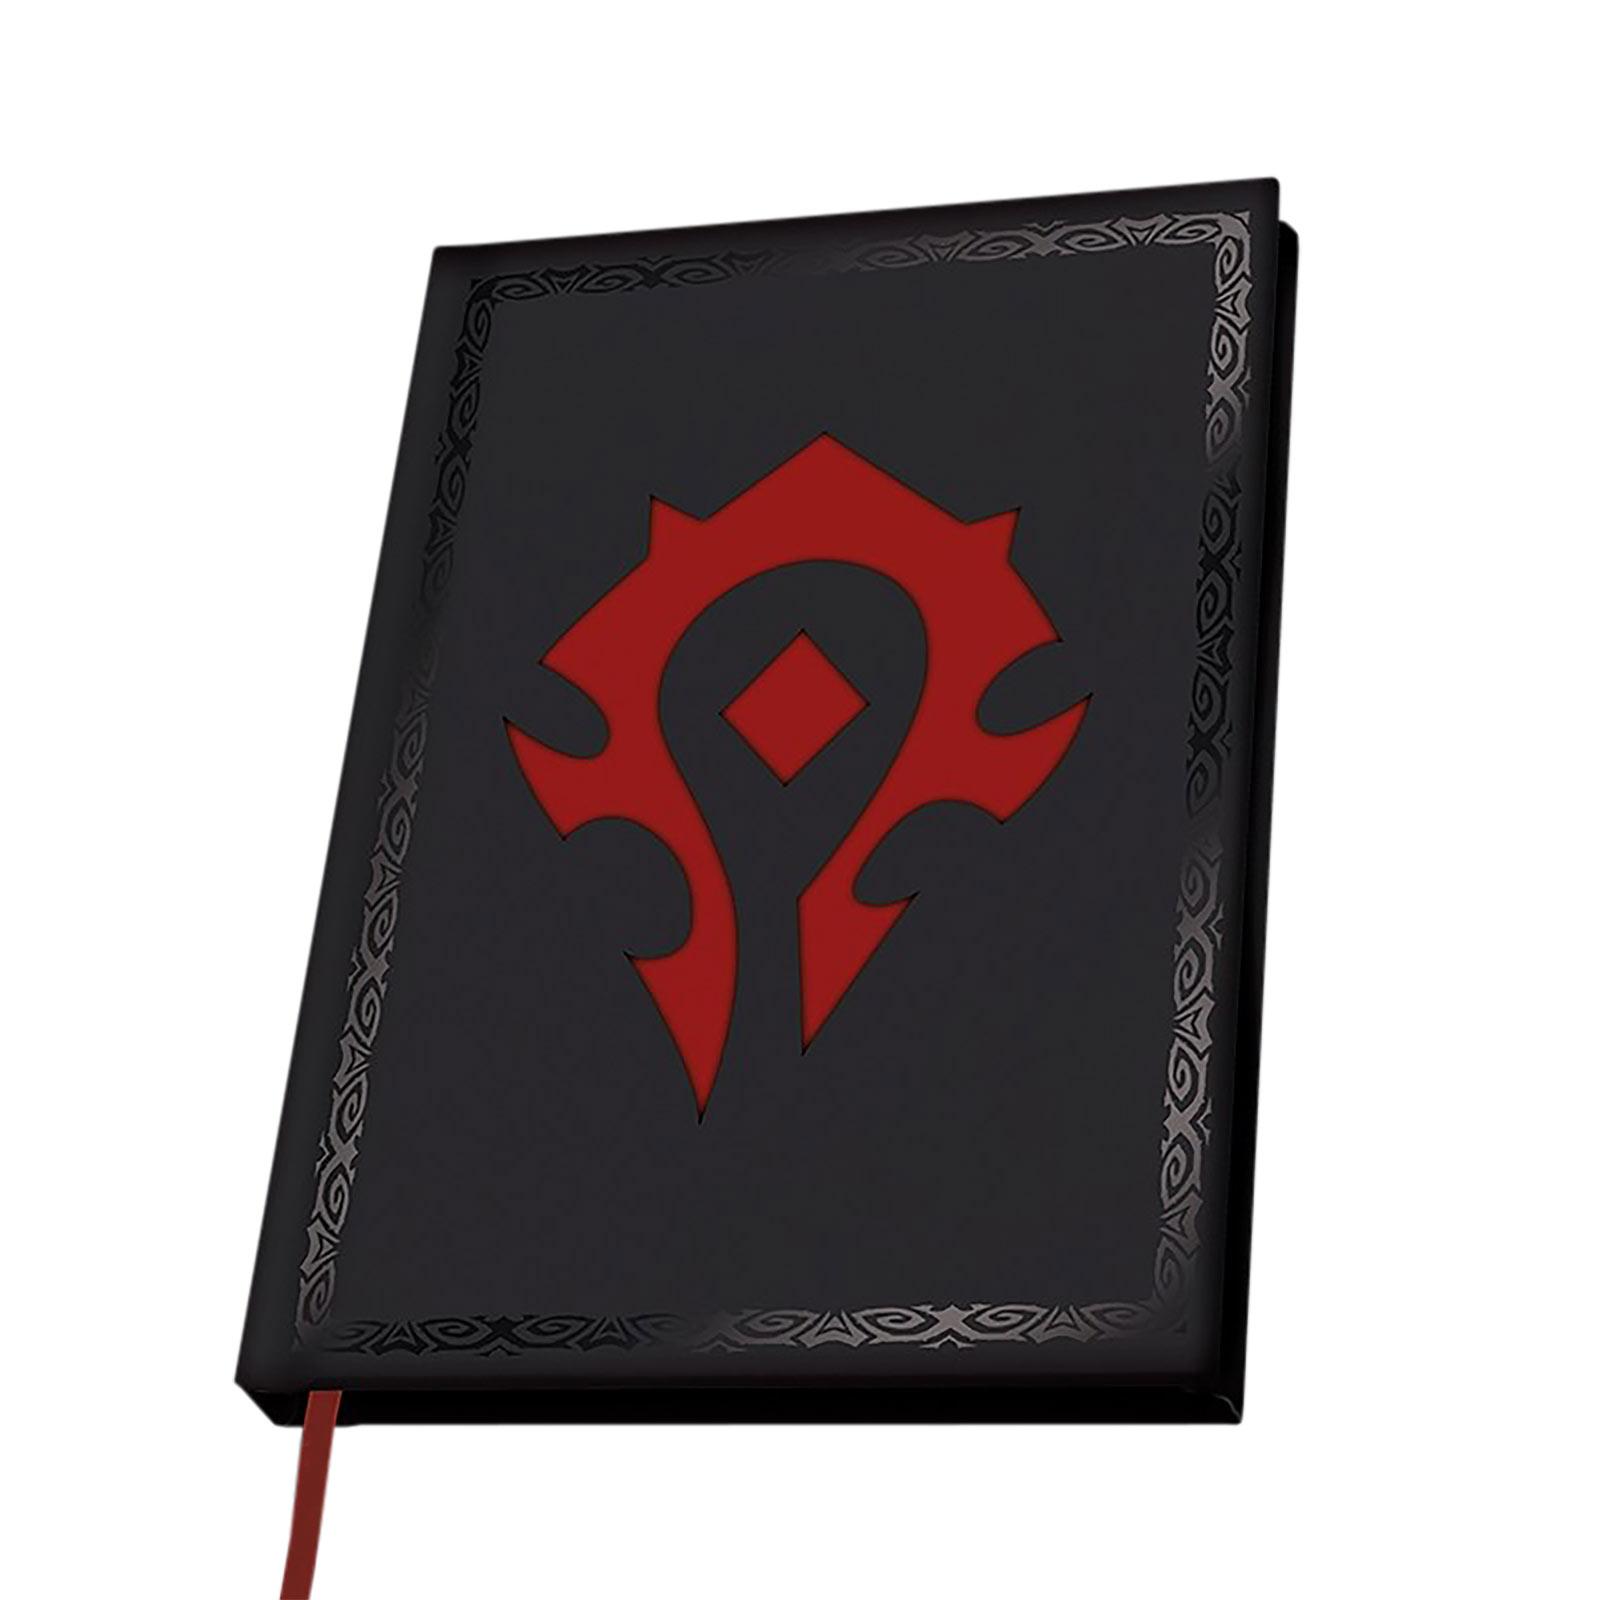 World of Warcraft - Horde Logo Notizbuch